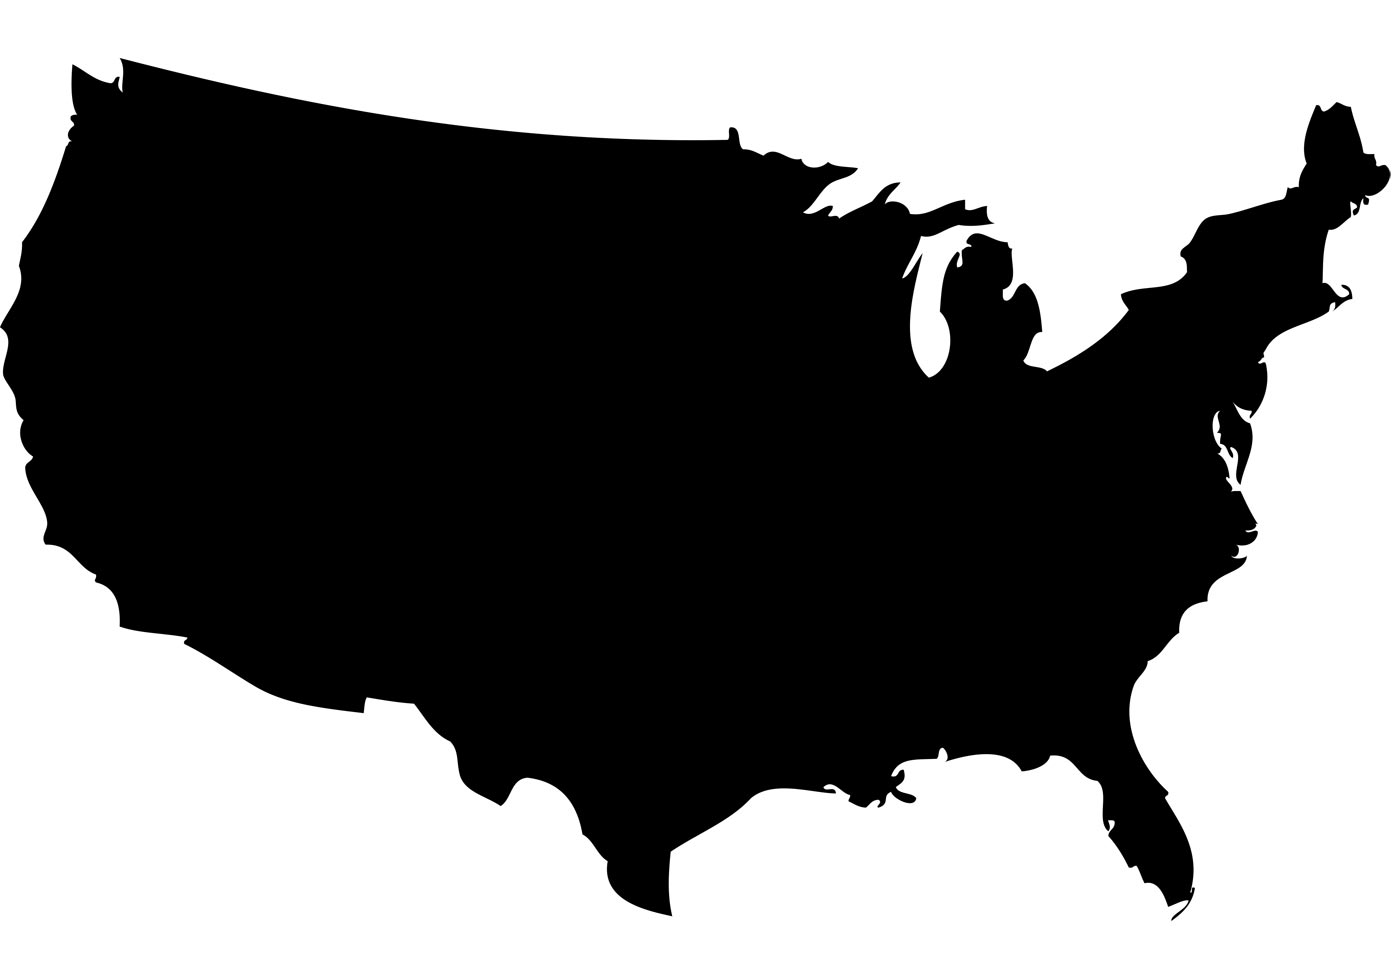 us-map-silhouette-vector.jpg